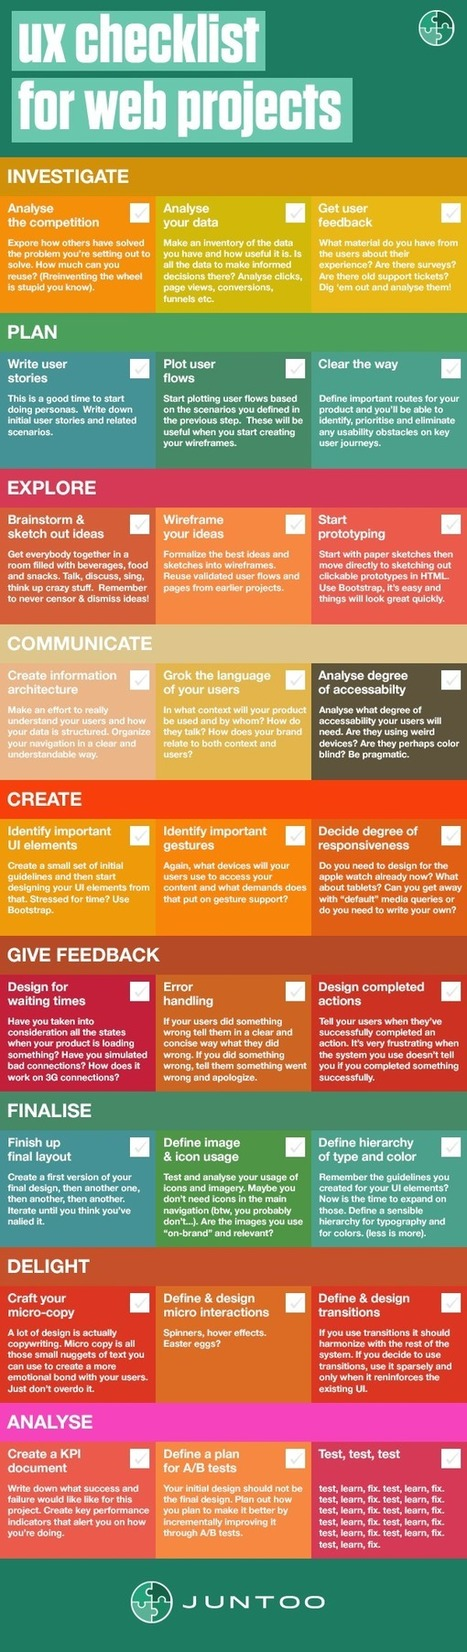 A UX Checklist For Web Projects | Linguagem Virtual | Scoop.it